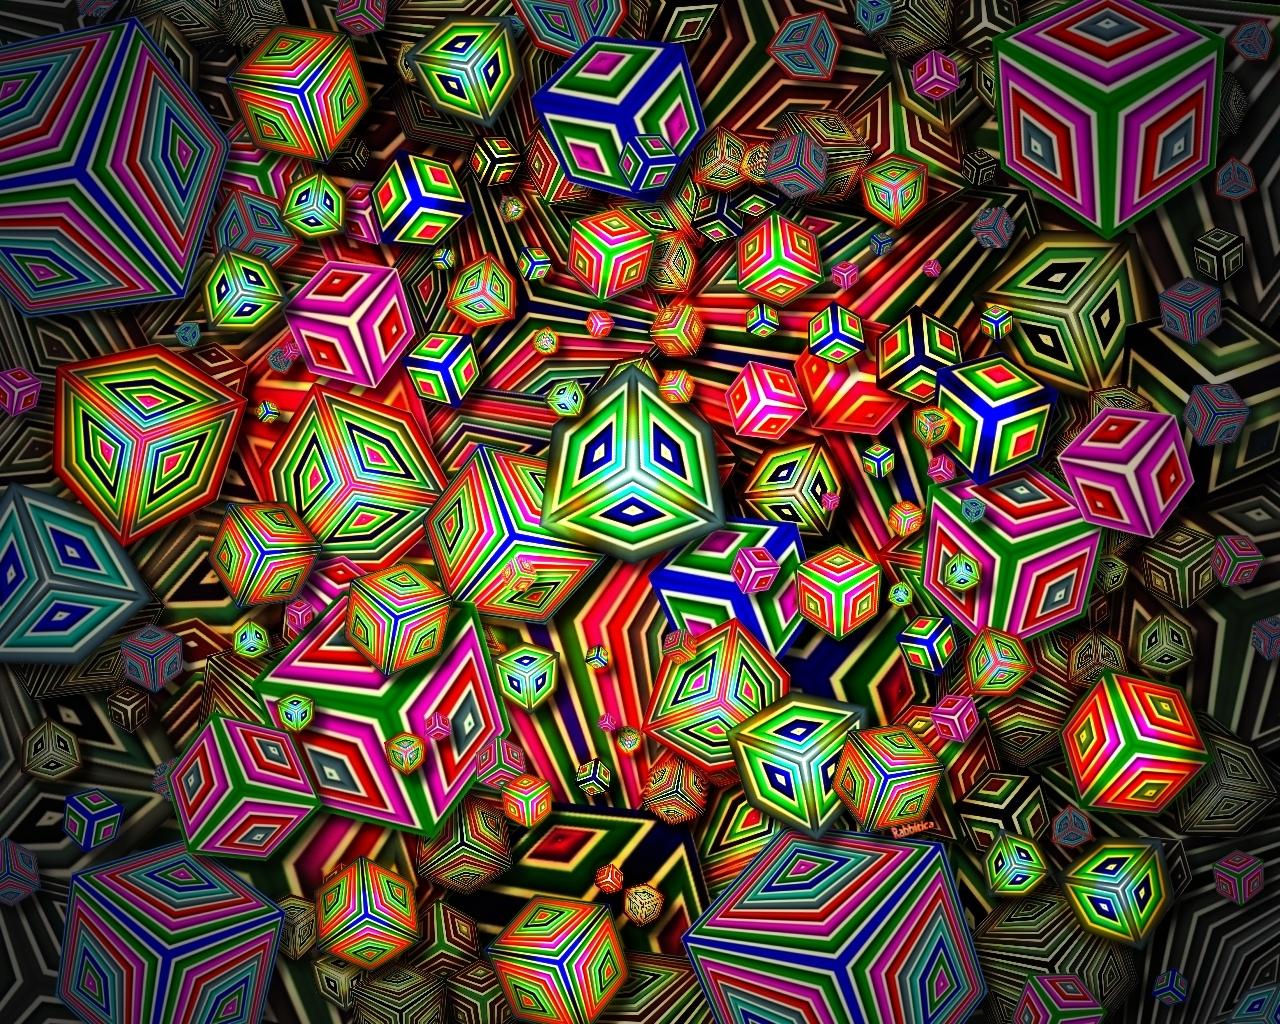 Shiny Happy Cubes by rabbitica